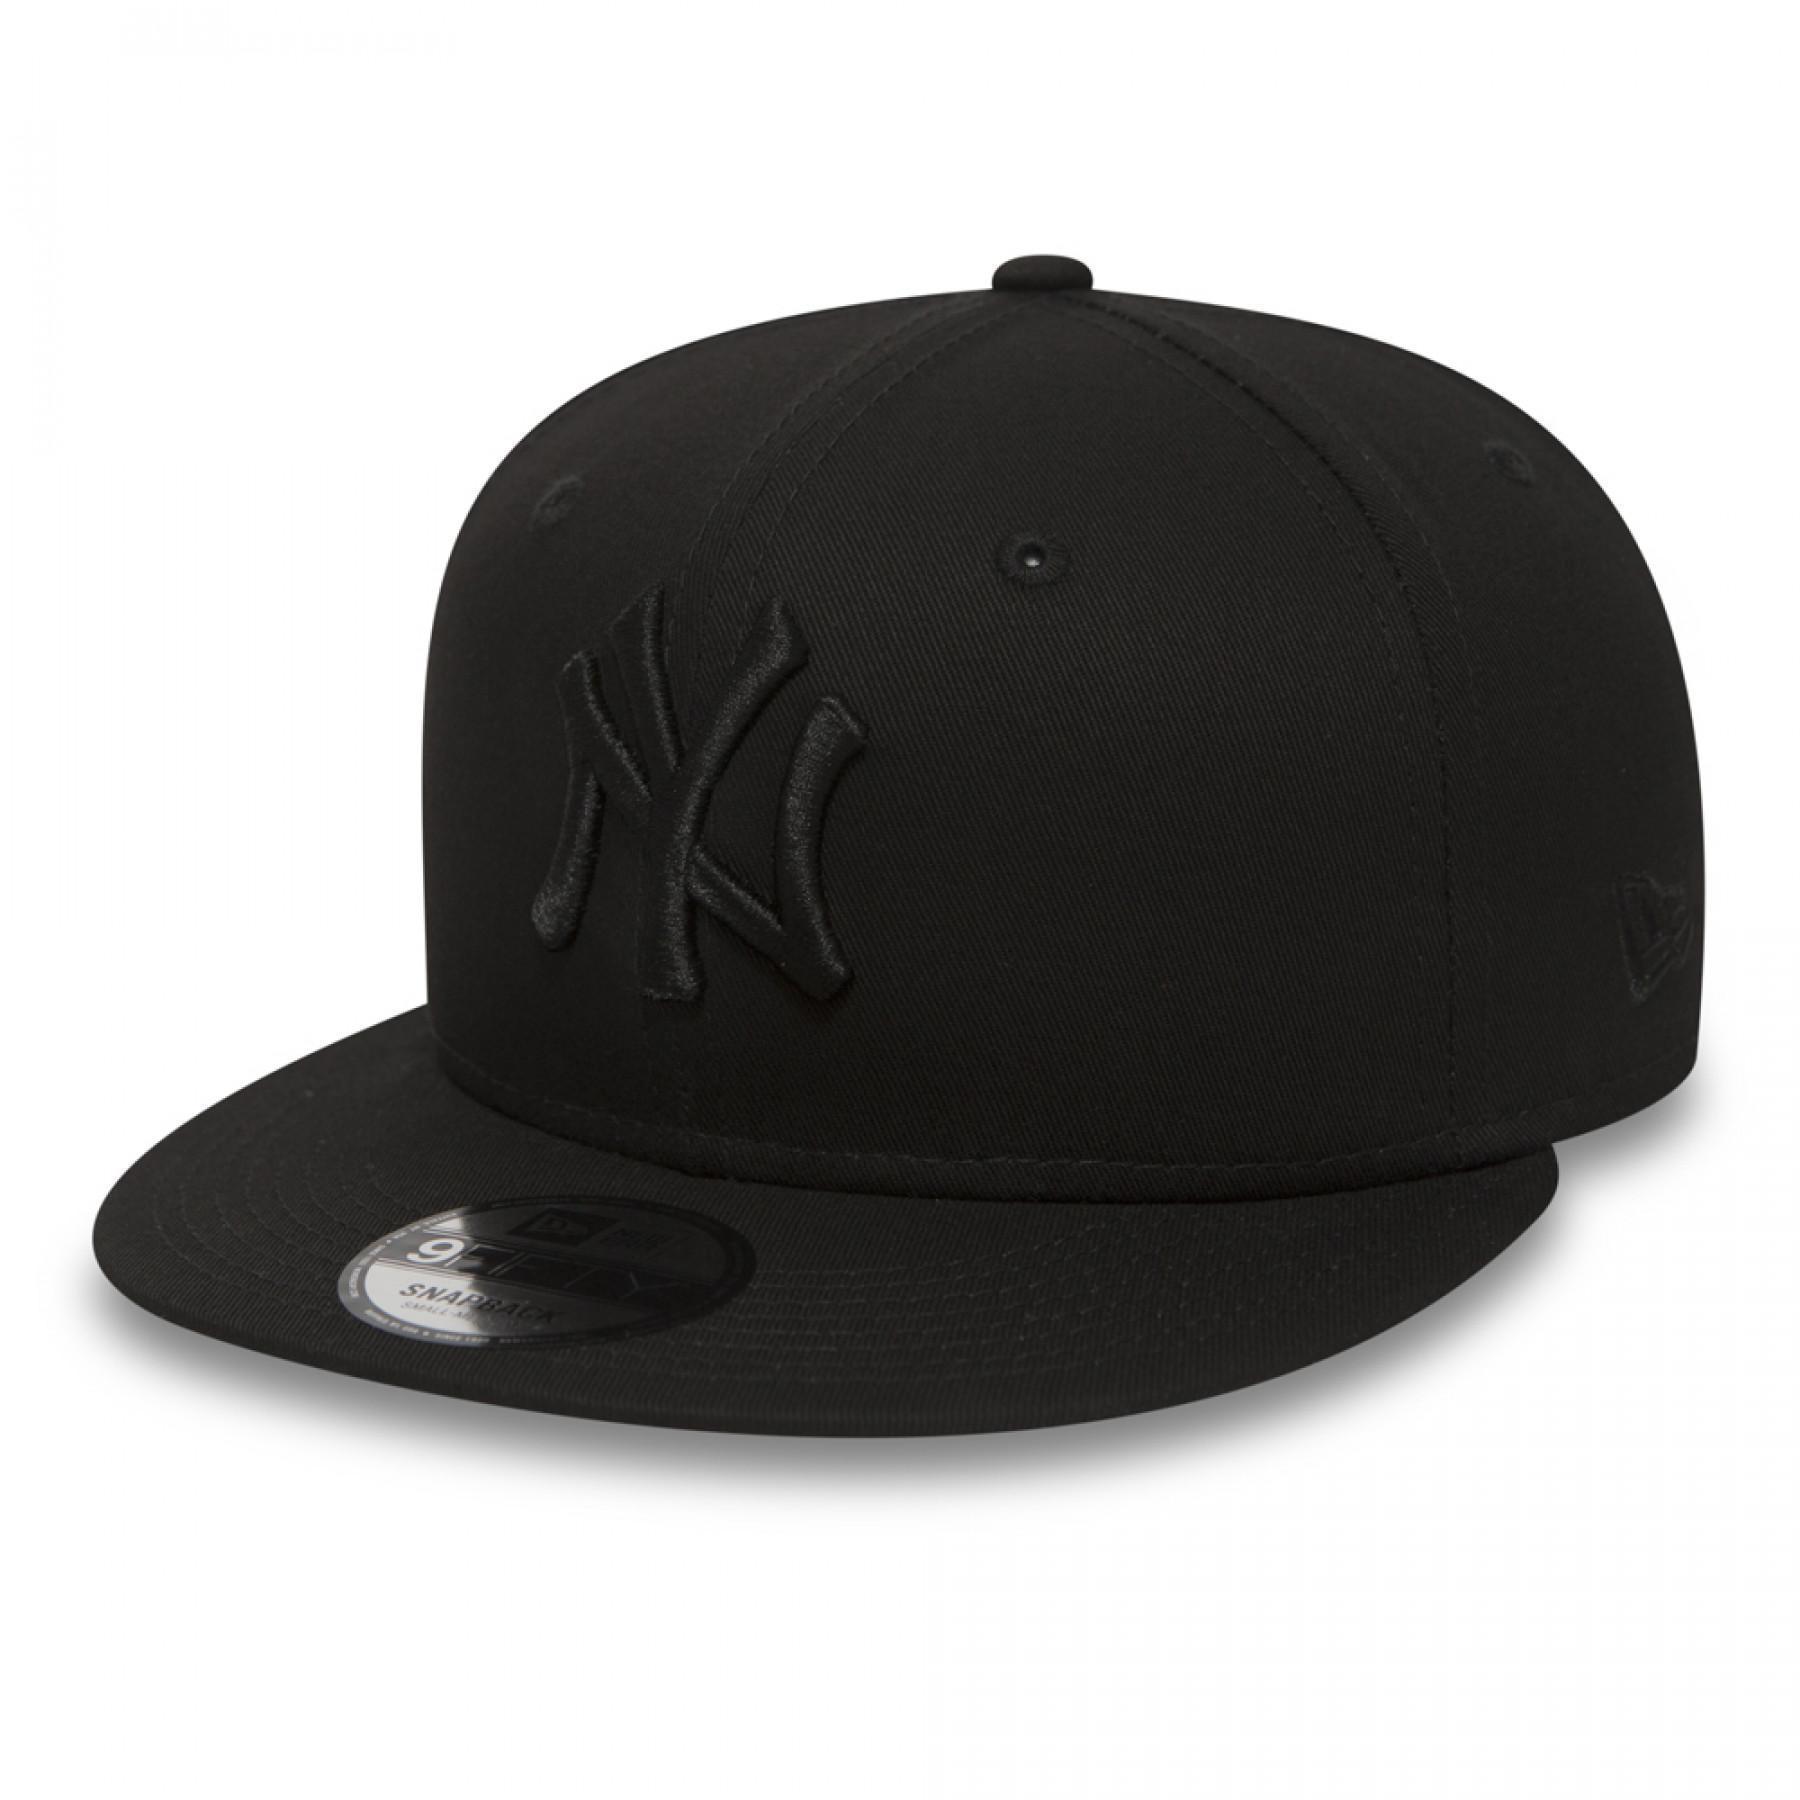 Casquette New Era 9fifty New York Yankees